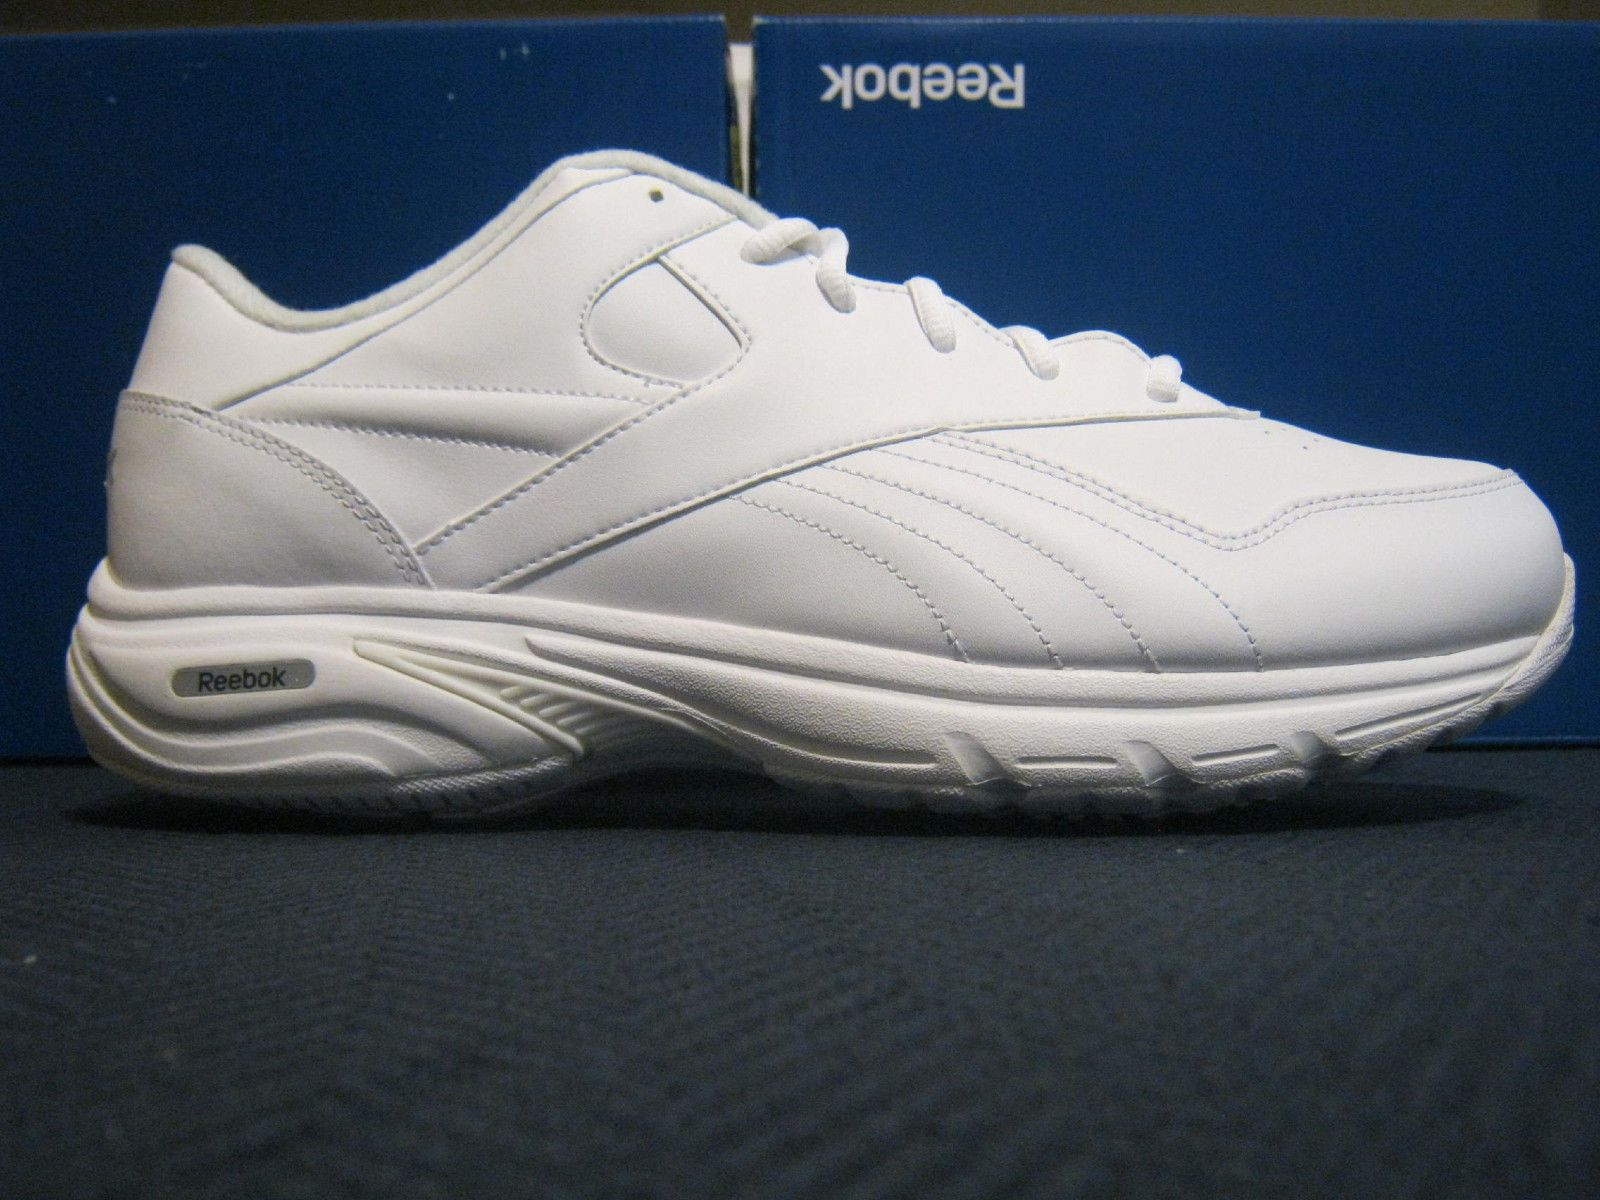 e19603a275d214 Mens REEBOK Comfort Deluxe II DMX Max White Leather Walking Size 14 Medium